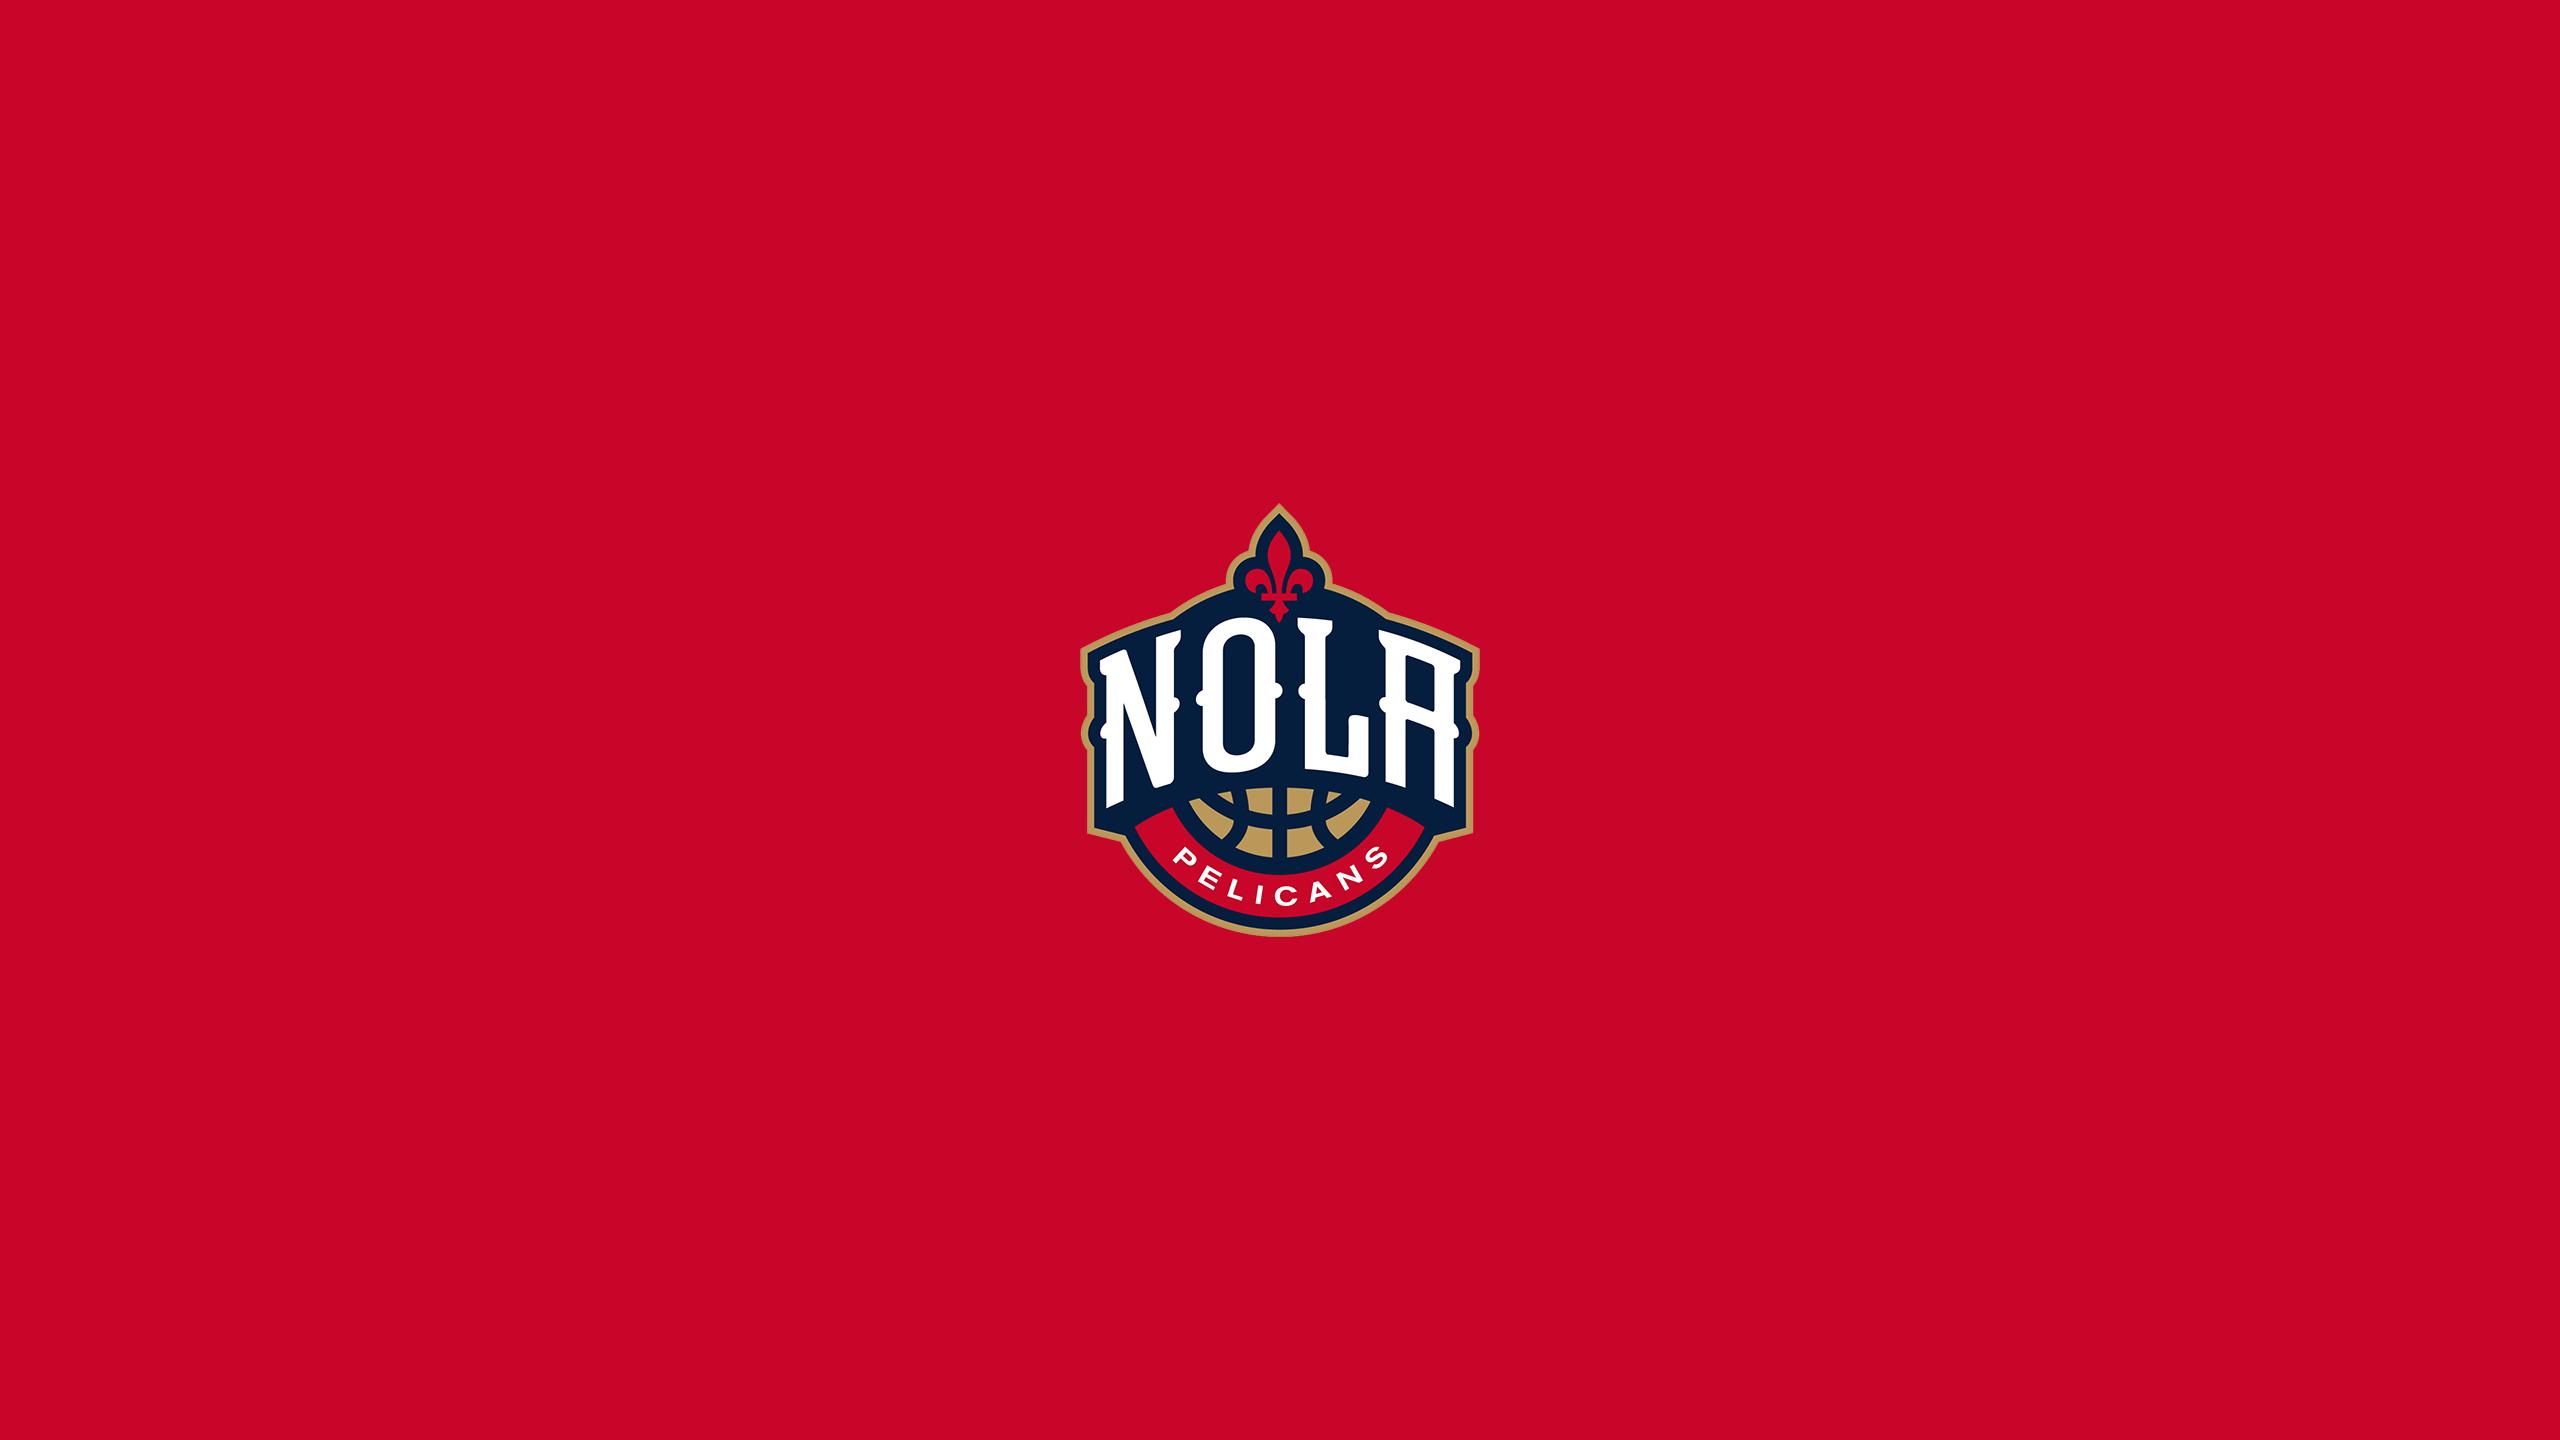 New Orleans Pelicans (NOLA)